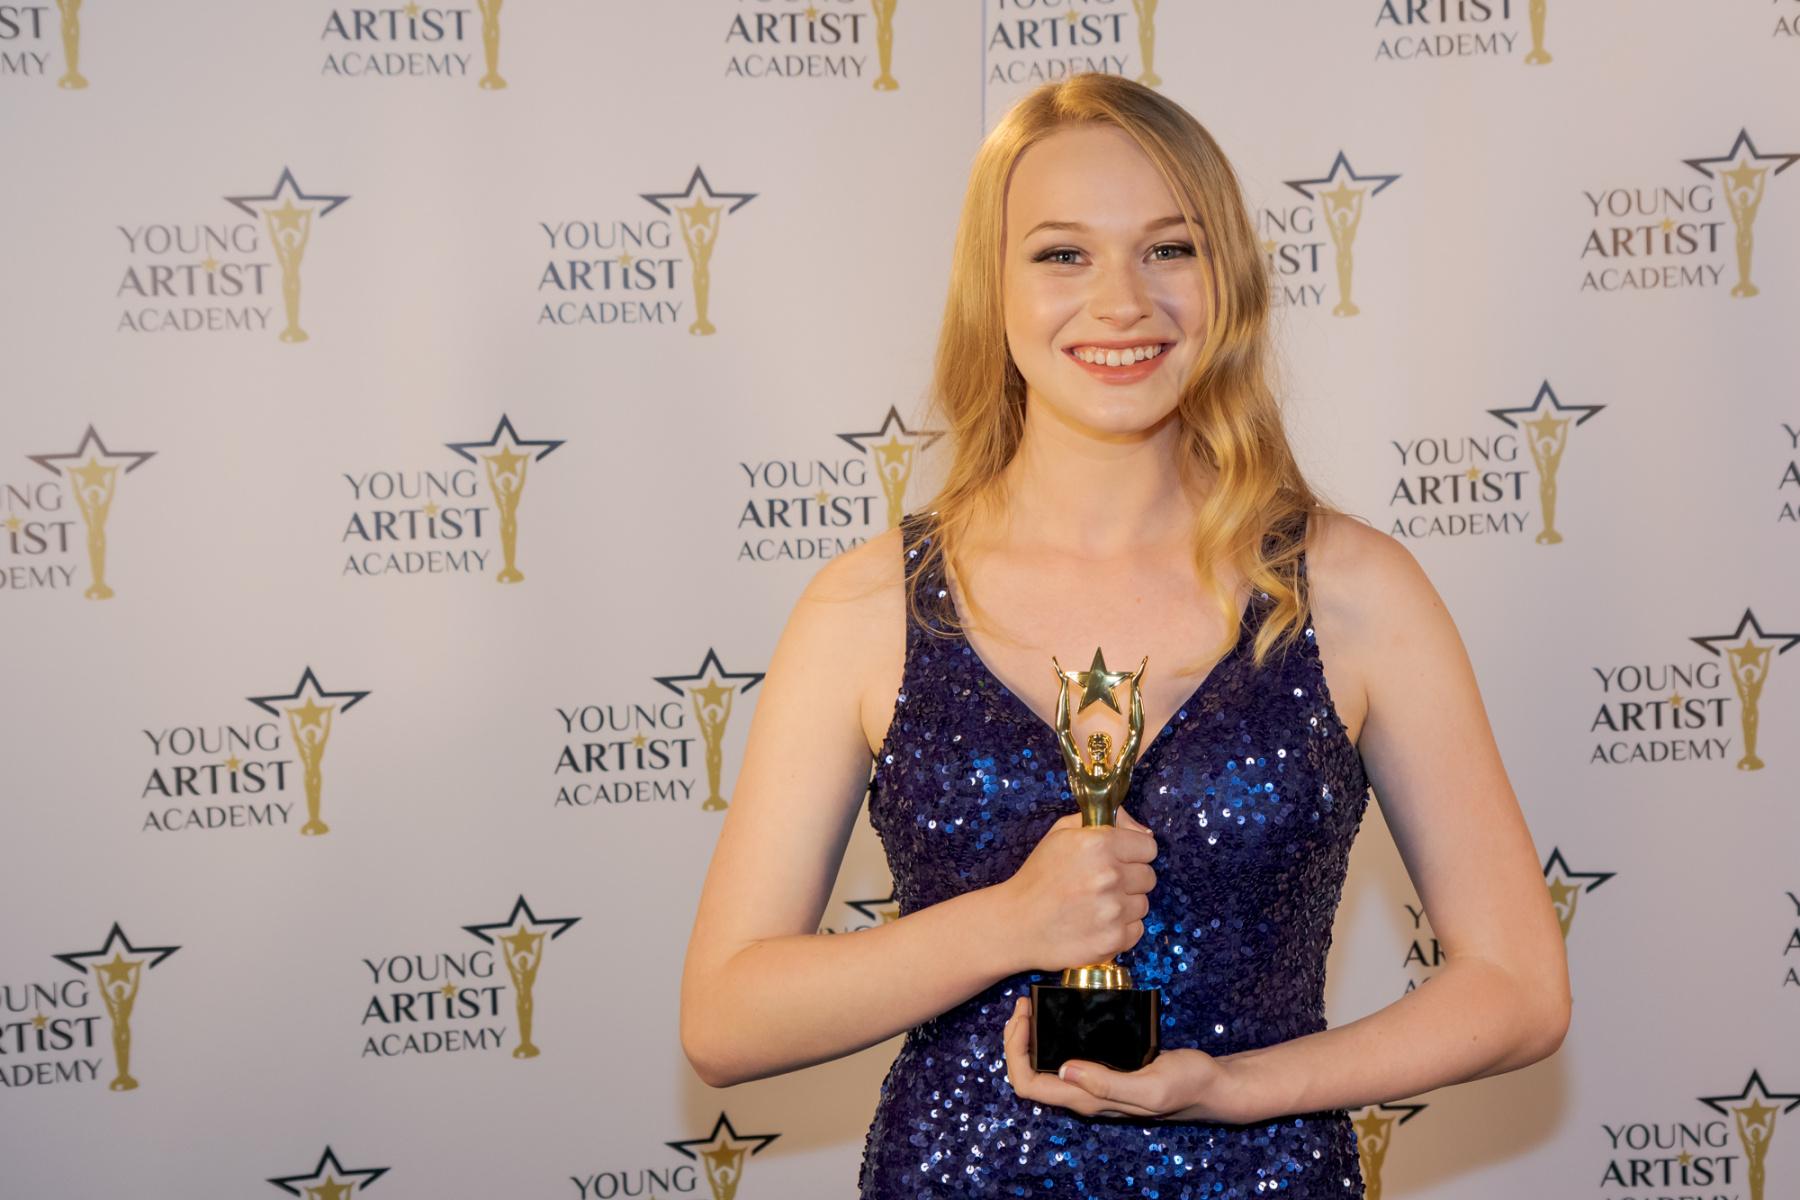 Rachelle-Henry-YAA-2019-Best-Producer